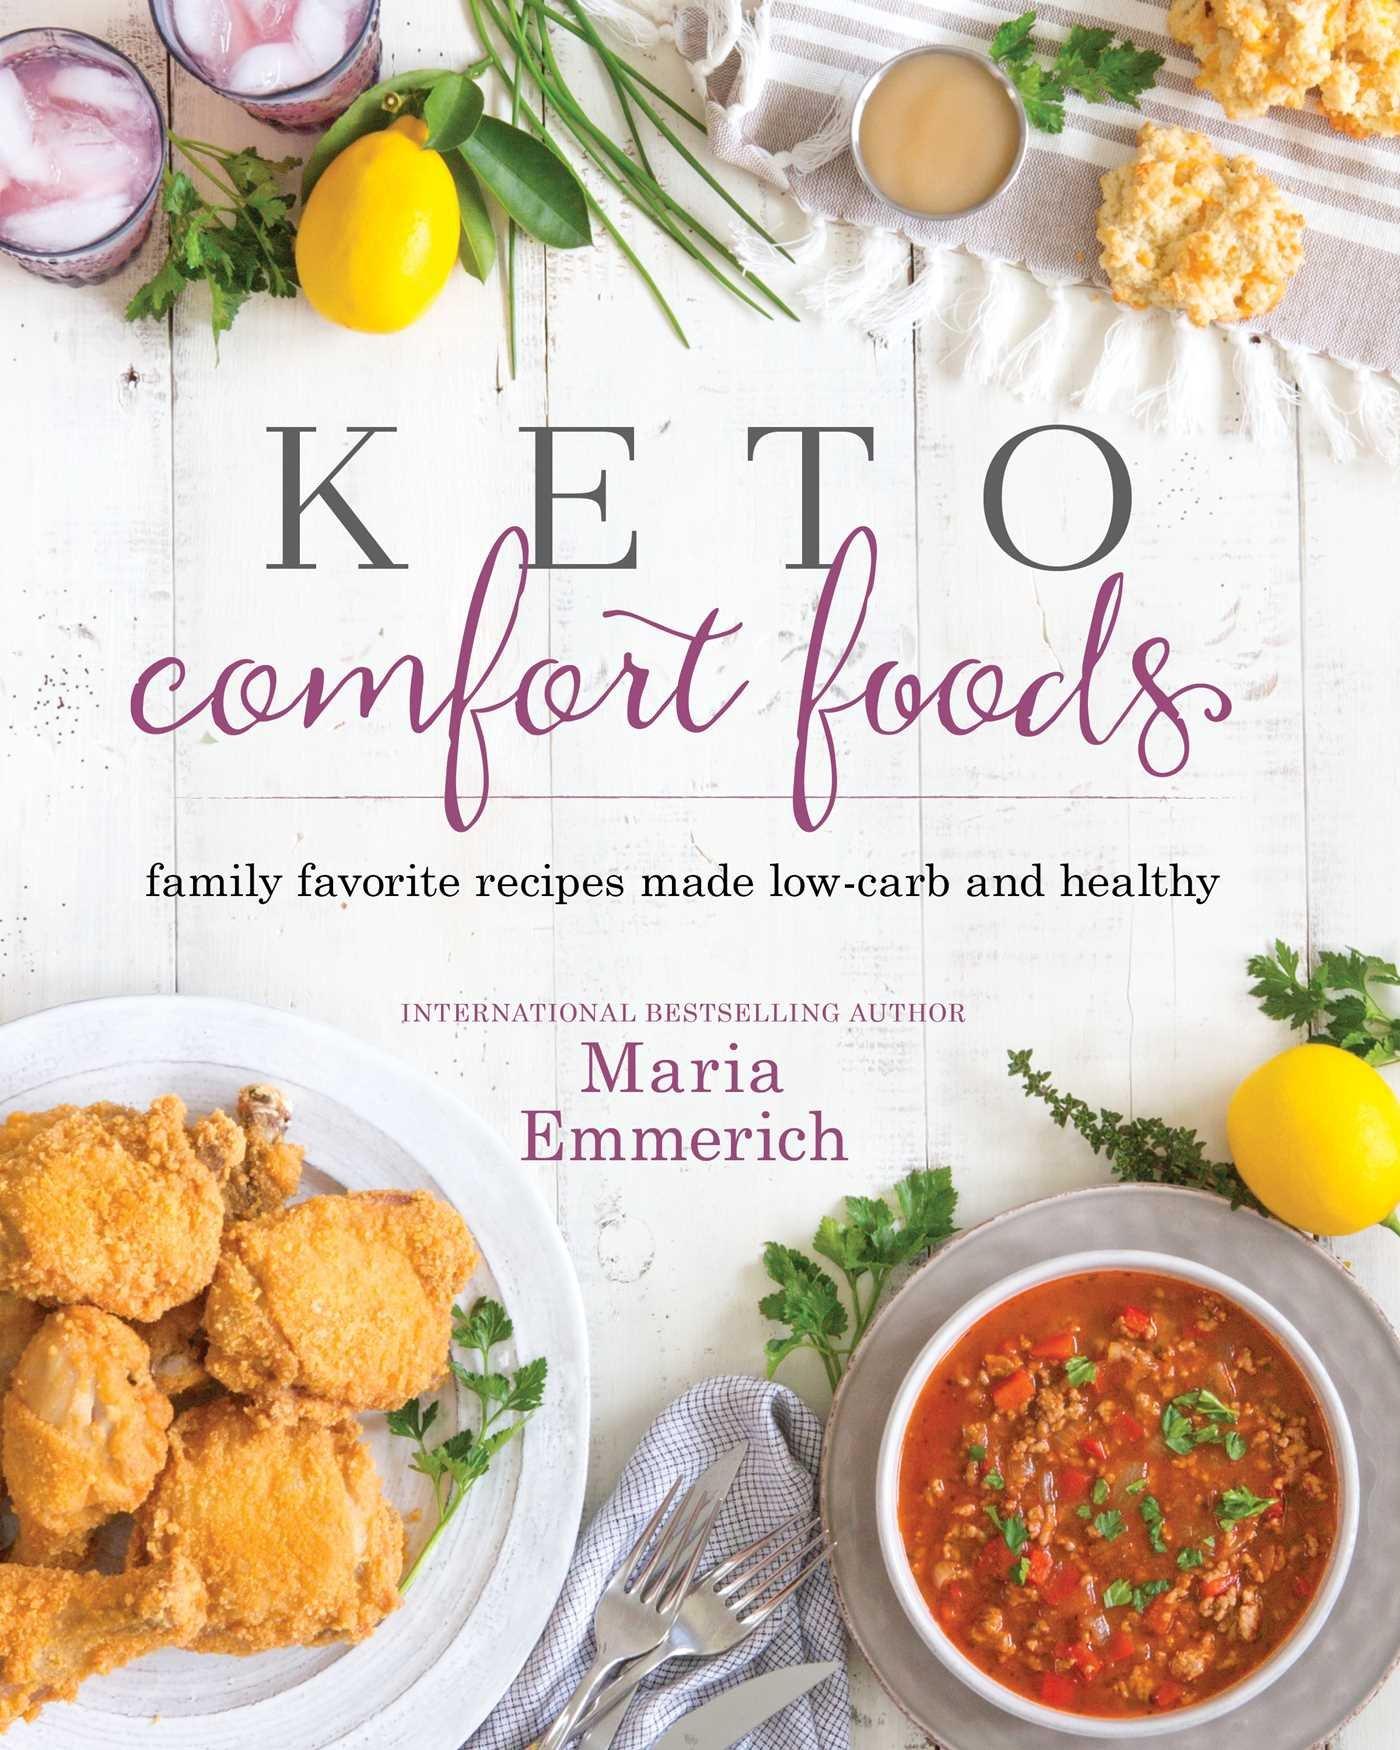 NEW Keto Cookbooks For Your Bookshelf